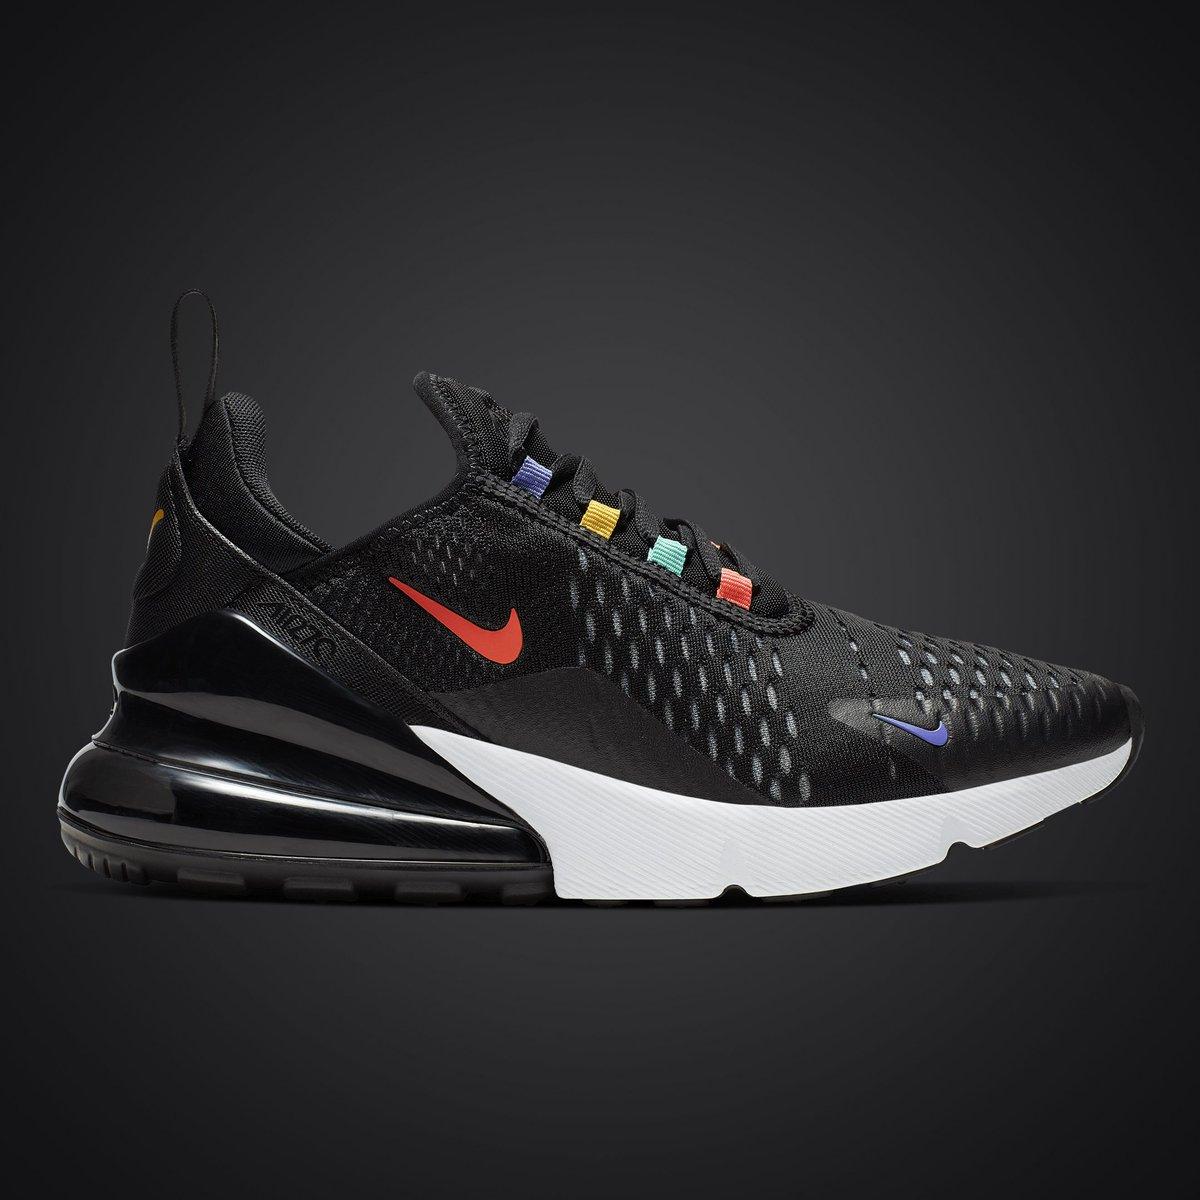 Nike Air Max 270 AH8050 023